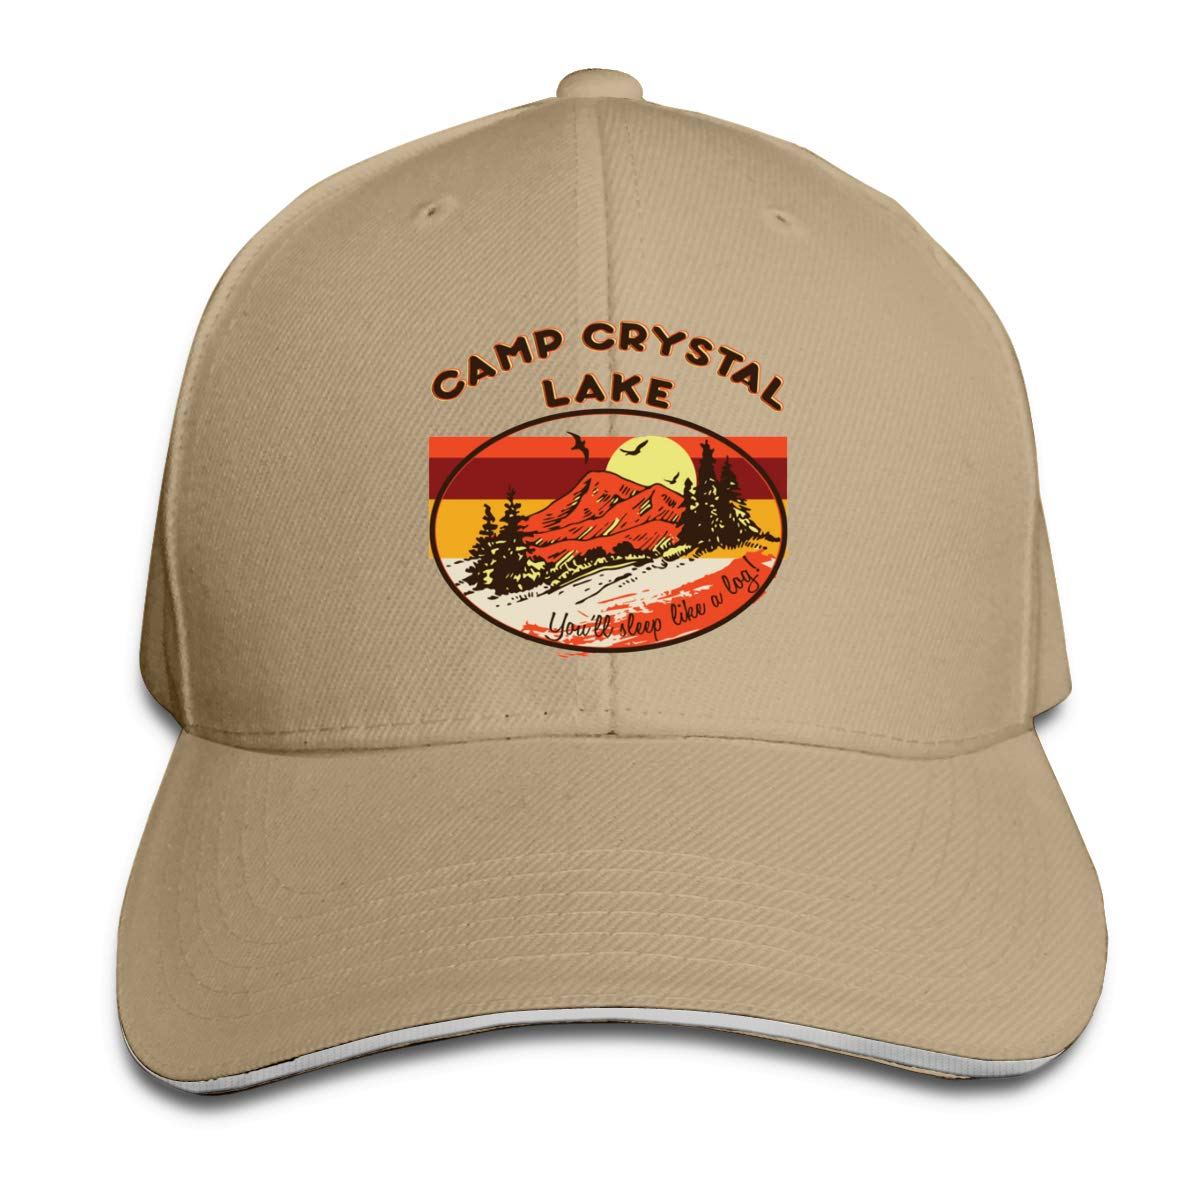 Camp Crystal Lake Unisex Adult Baseball Caps Adjustable Sandwich Caps Jeans Caps Adjustable Denim Trucker Cap